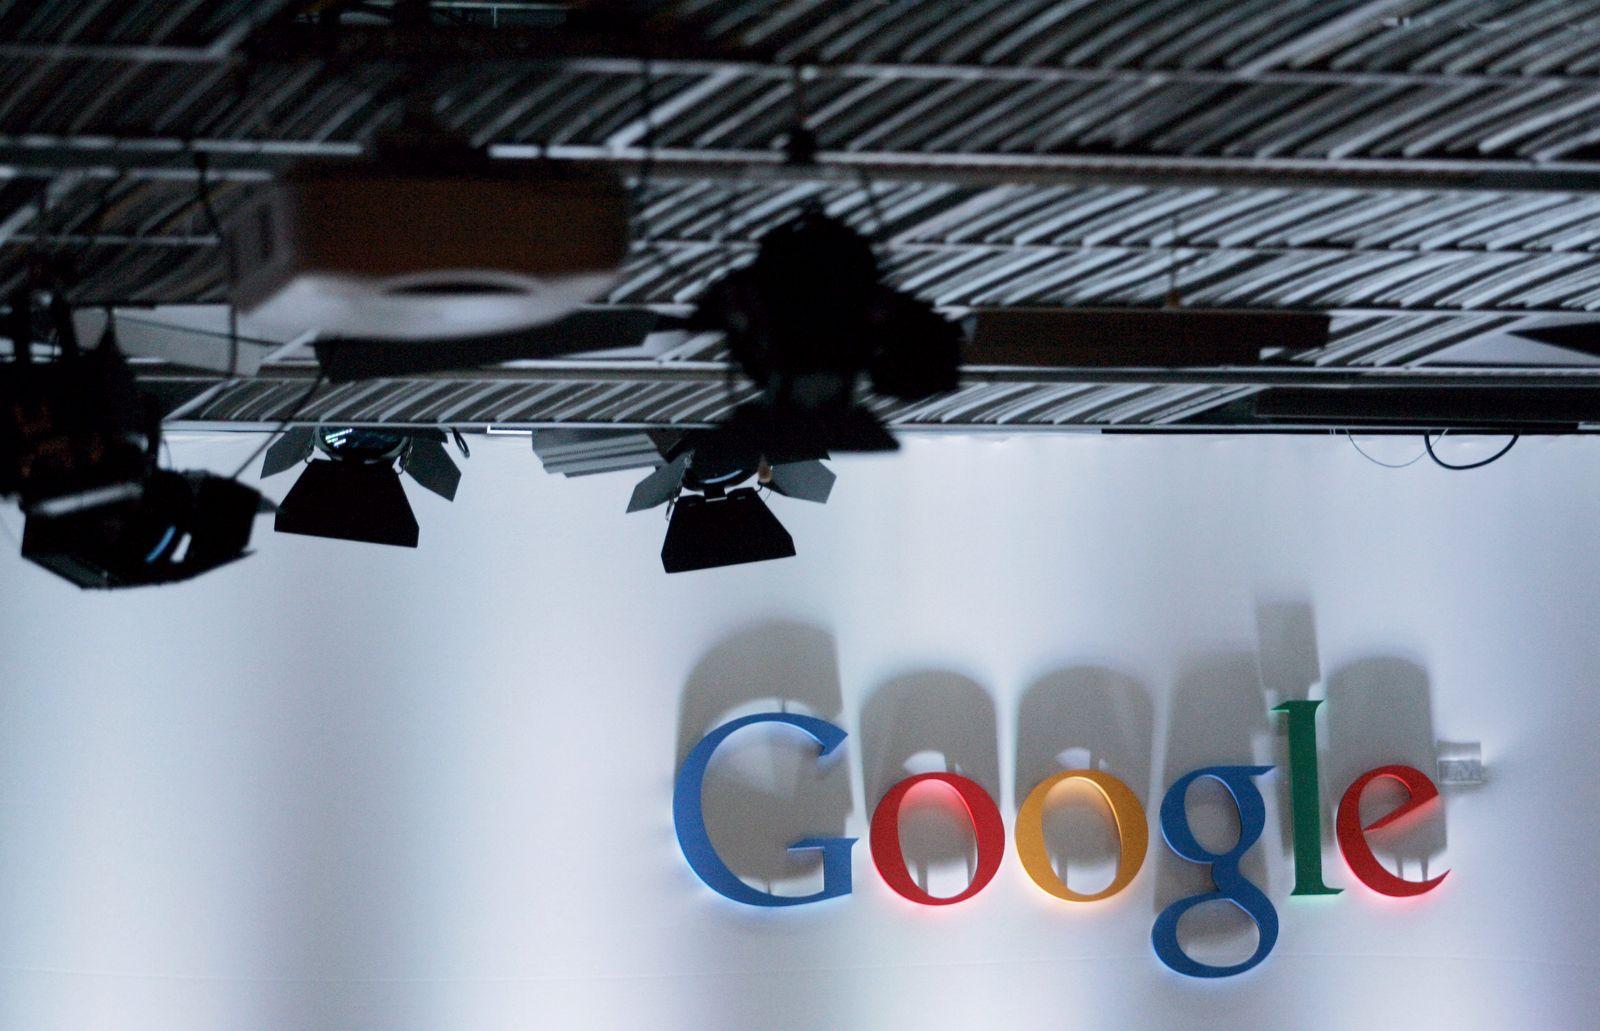 mmo-Themenseite Google: Google droht mit Rückzug aus China